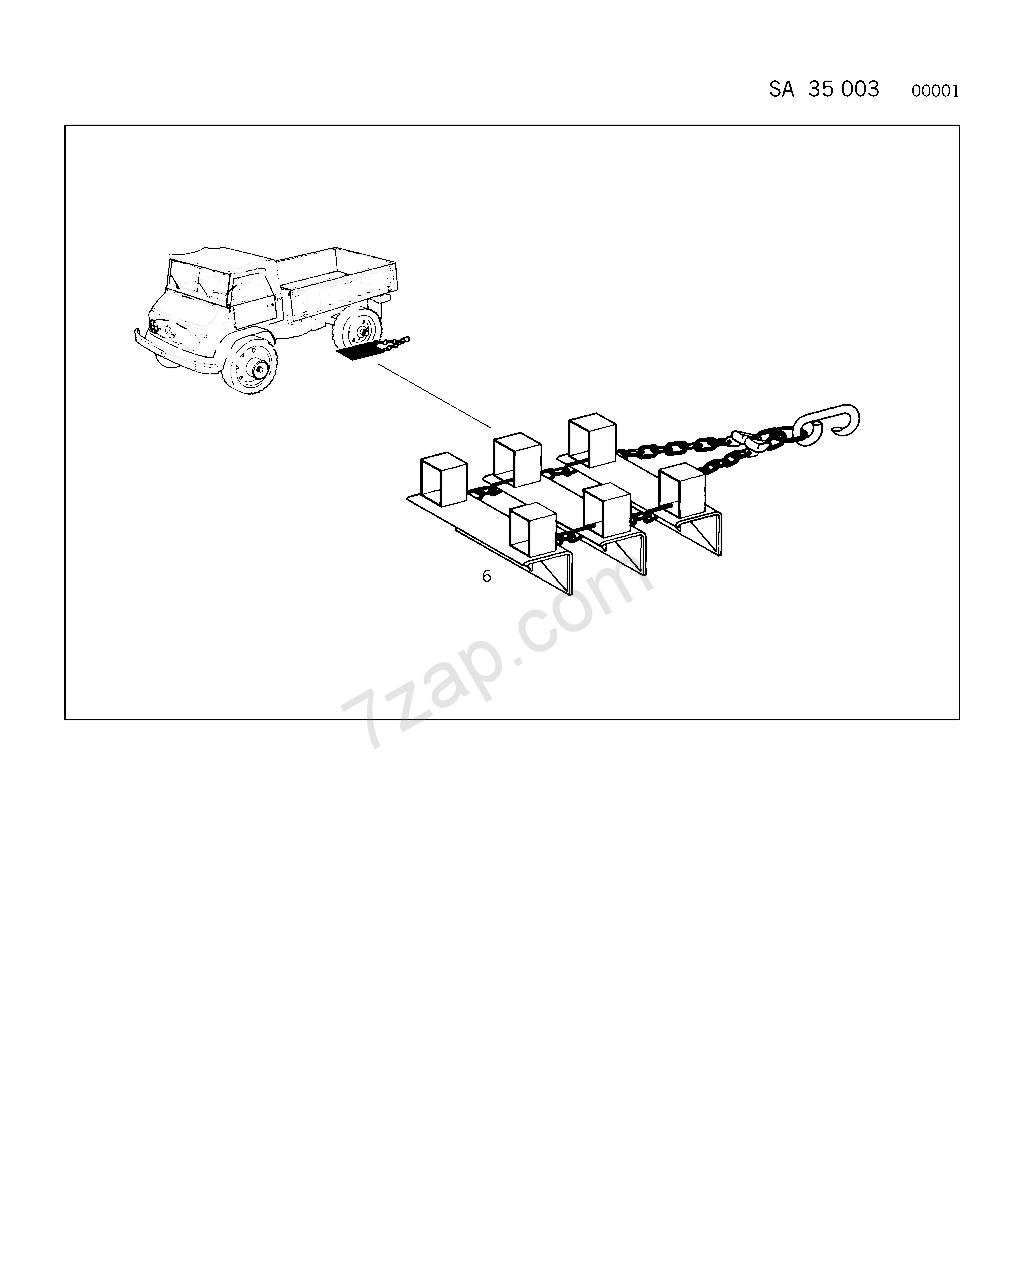 restauration unimog 411 112 par nico 700 raptor - Page 37 S0350010